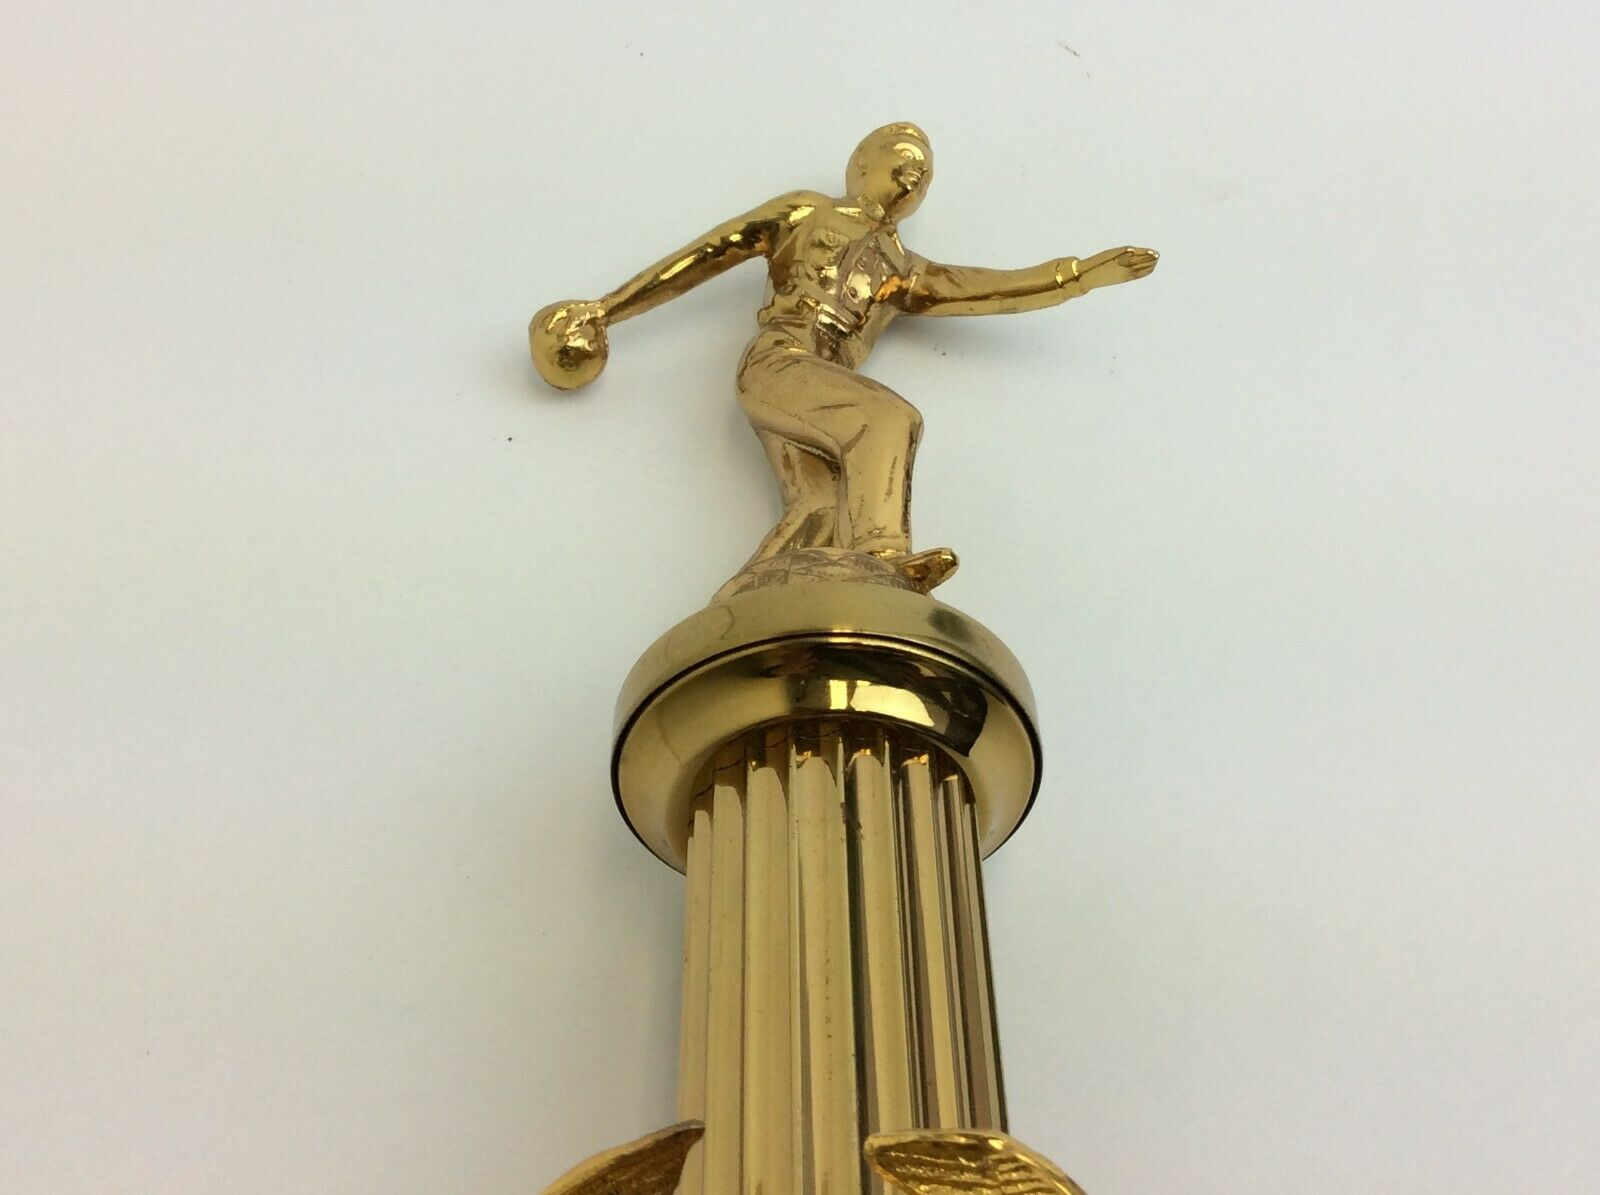 Grange Bowling Liga Stürzen Dorf 1958-1959 Meisterschaft Team Bowling Trophäe Weitere Sportarten